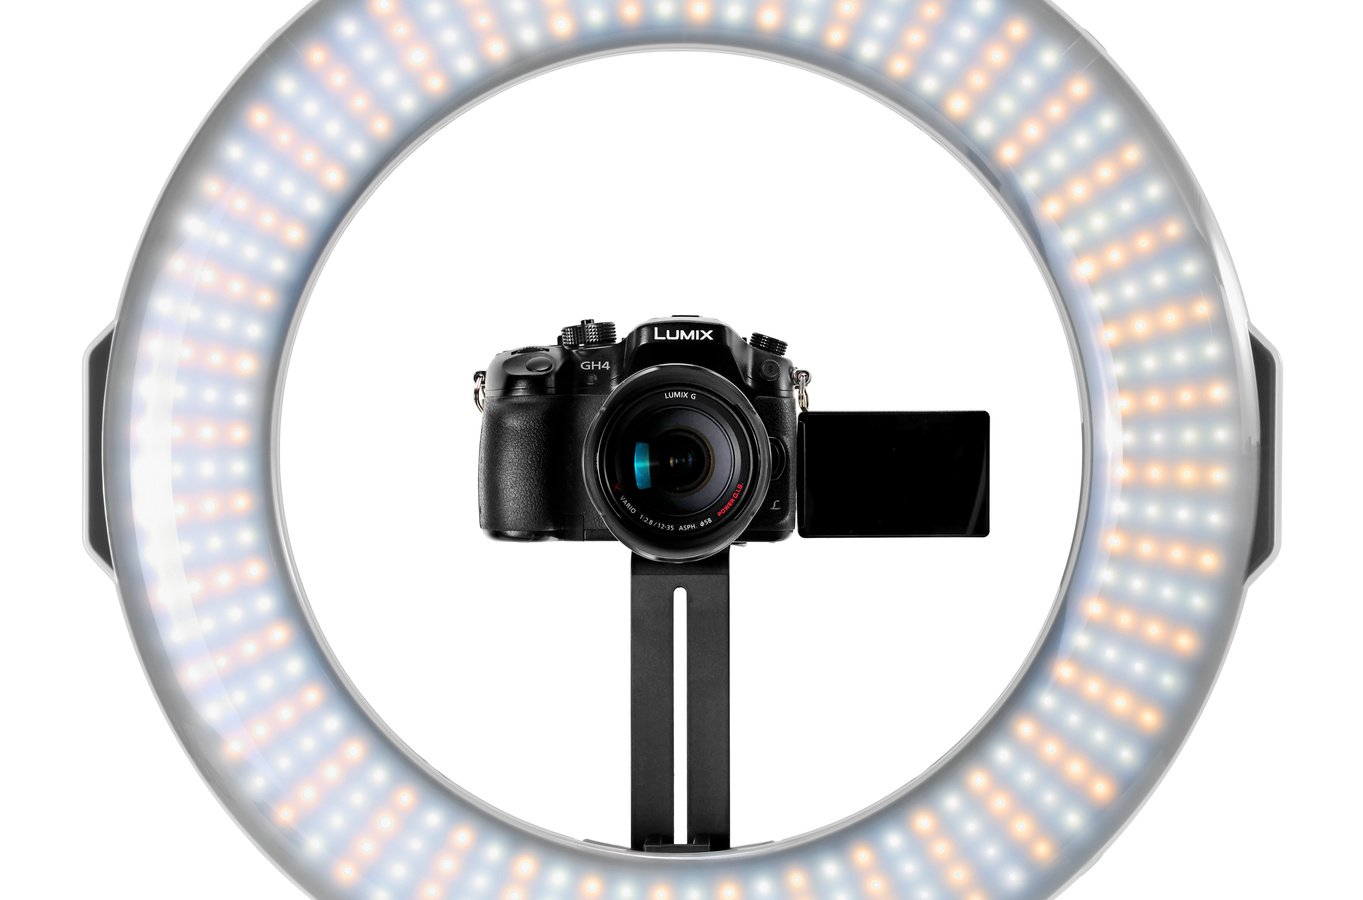 Panasonic GH4 eingebaut in LED Ringleuchte.